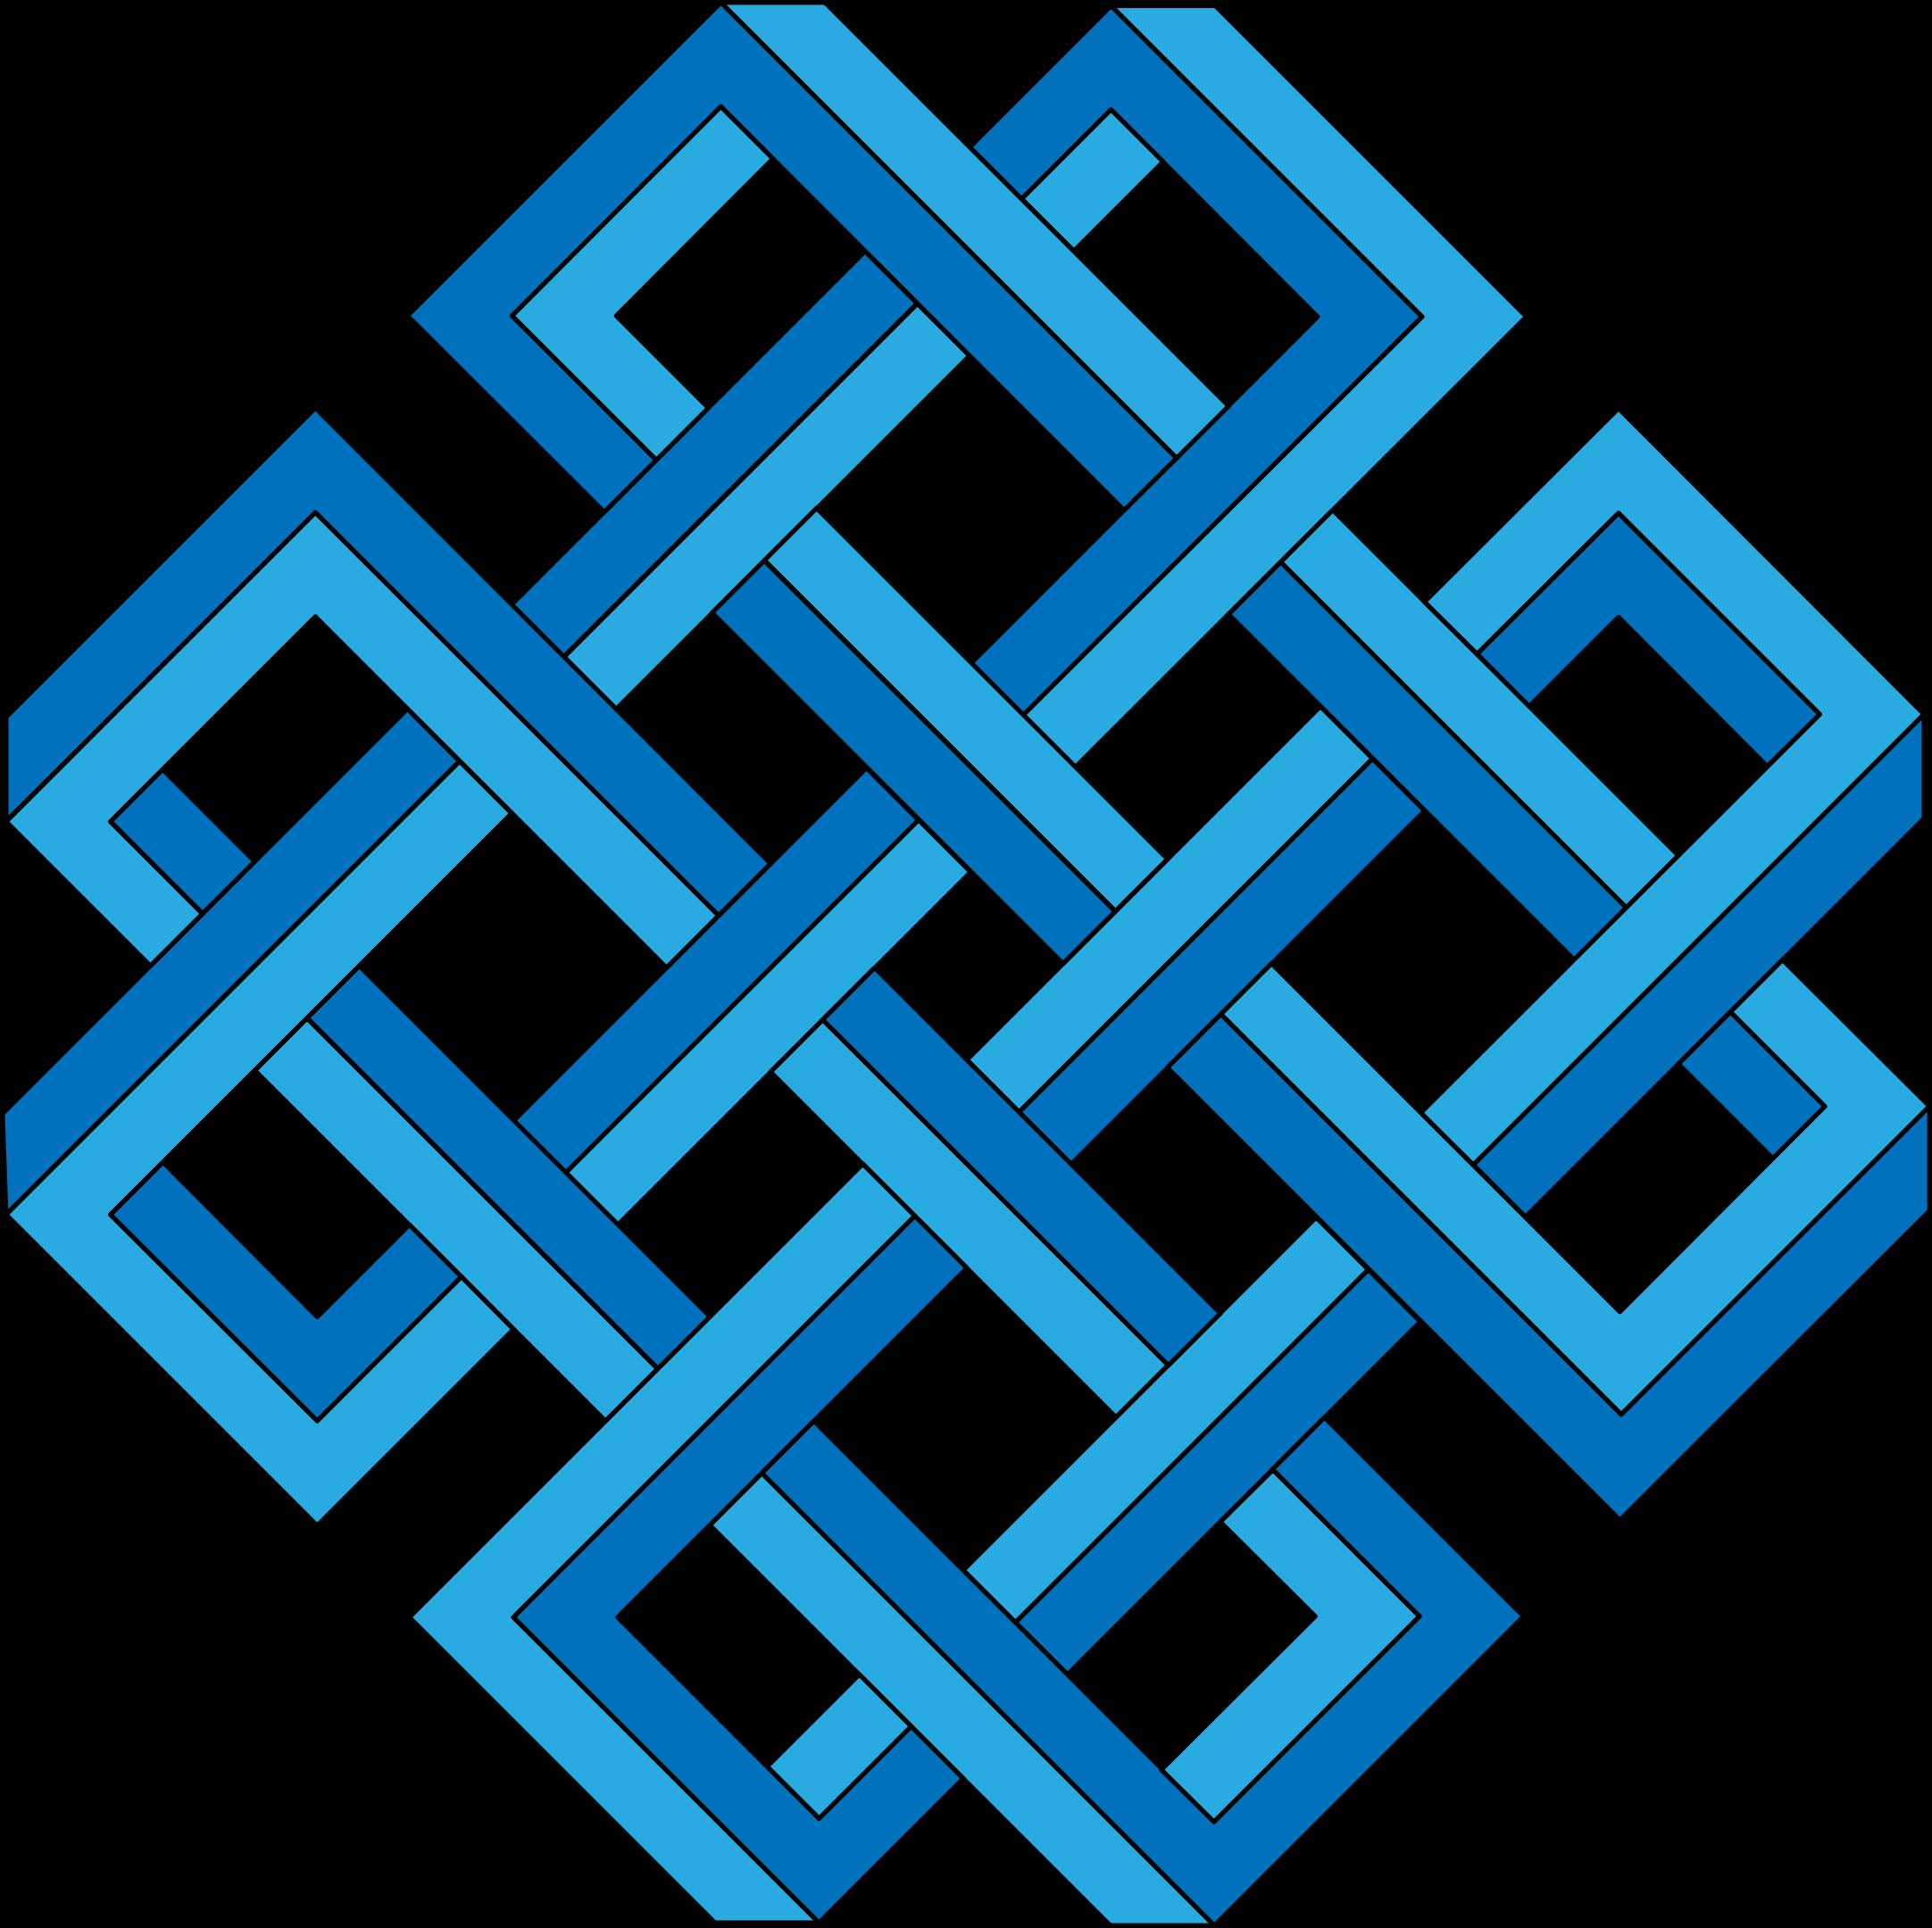 Illusion clipart optical illusion Illusion illusion Lattice optical Clipart